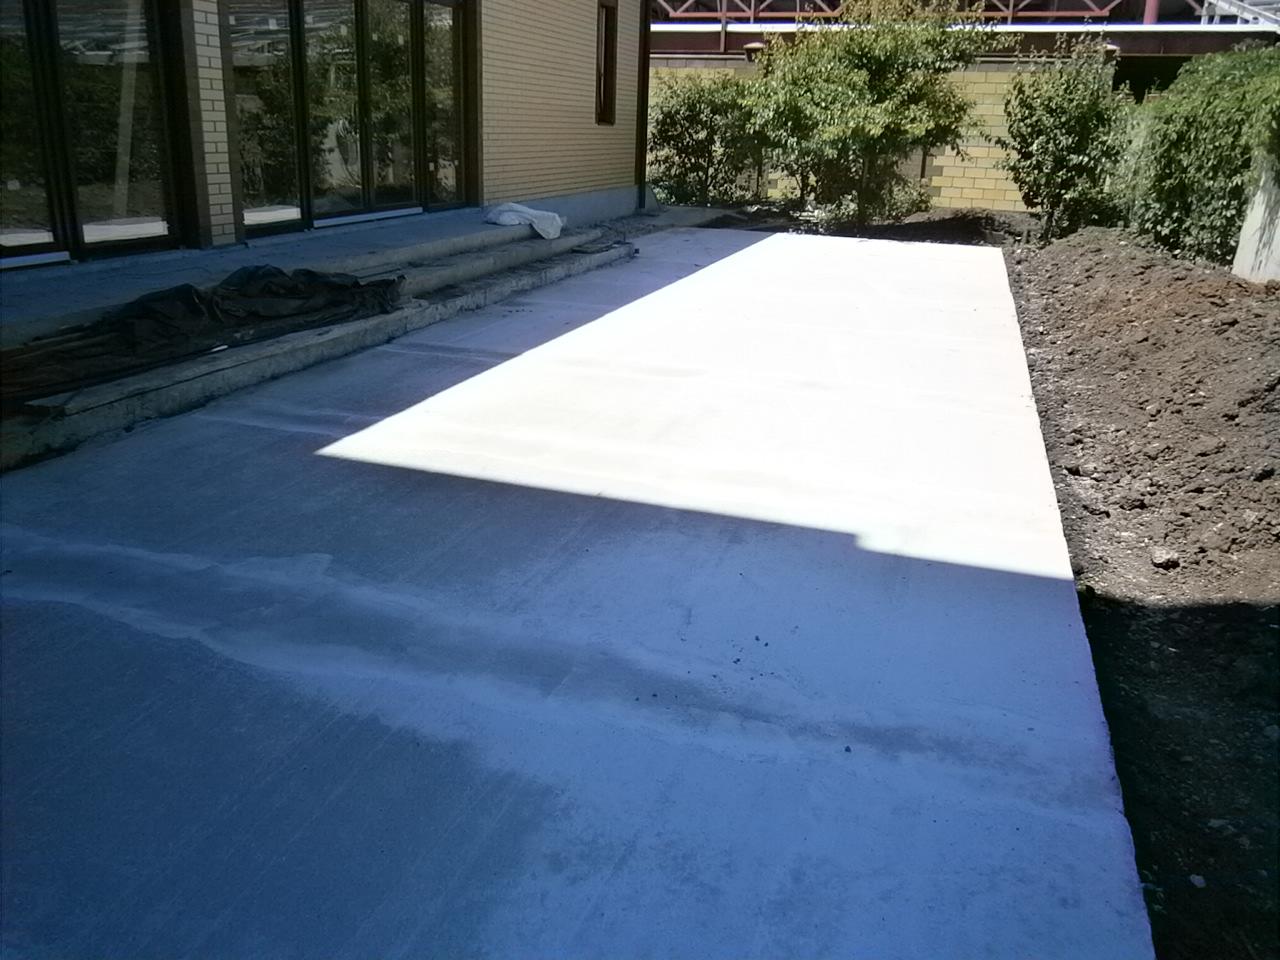 Как правильно заливать бетон во дворе